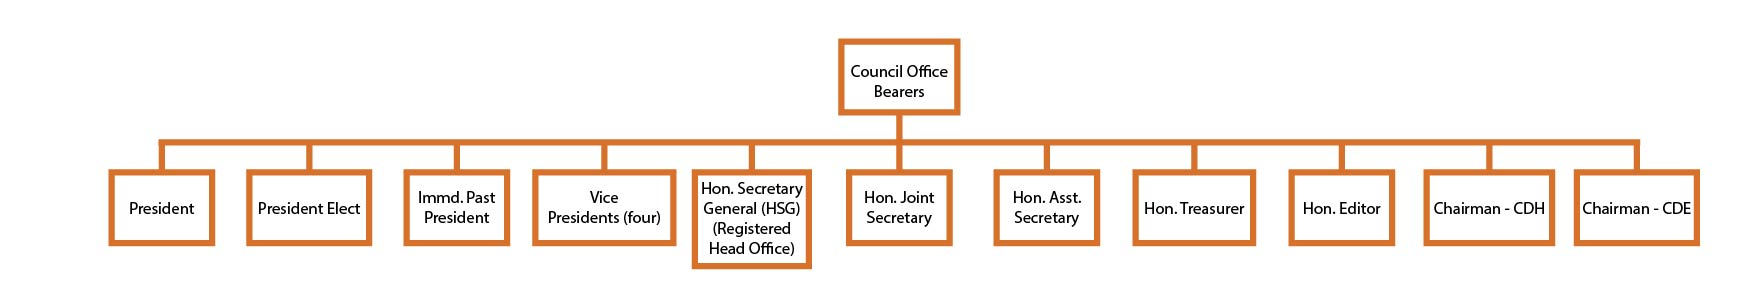 Council Office Bearers